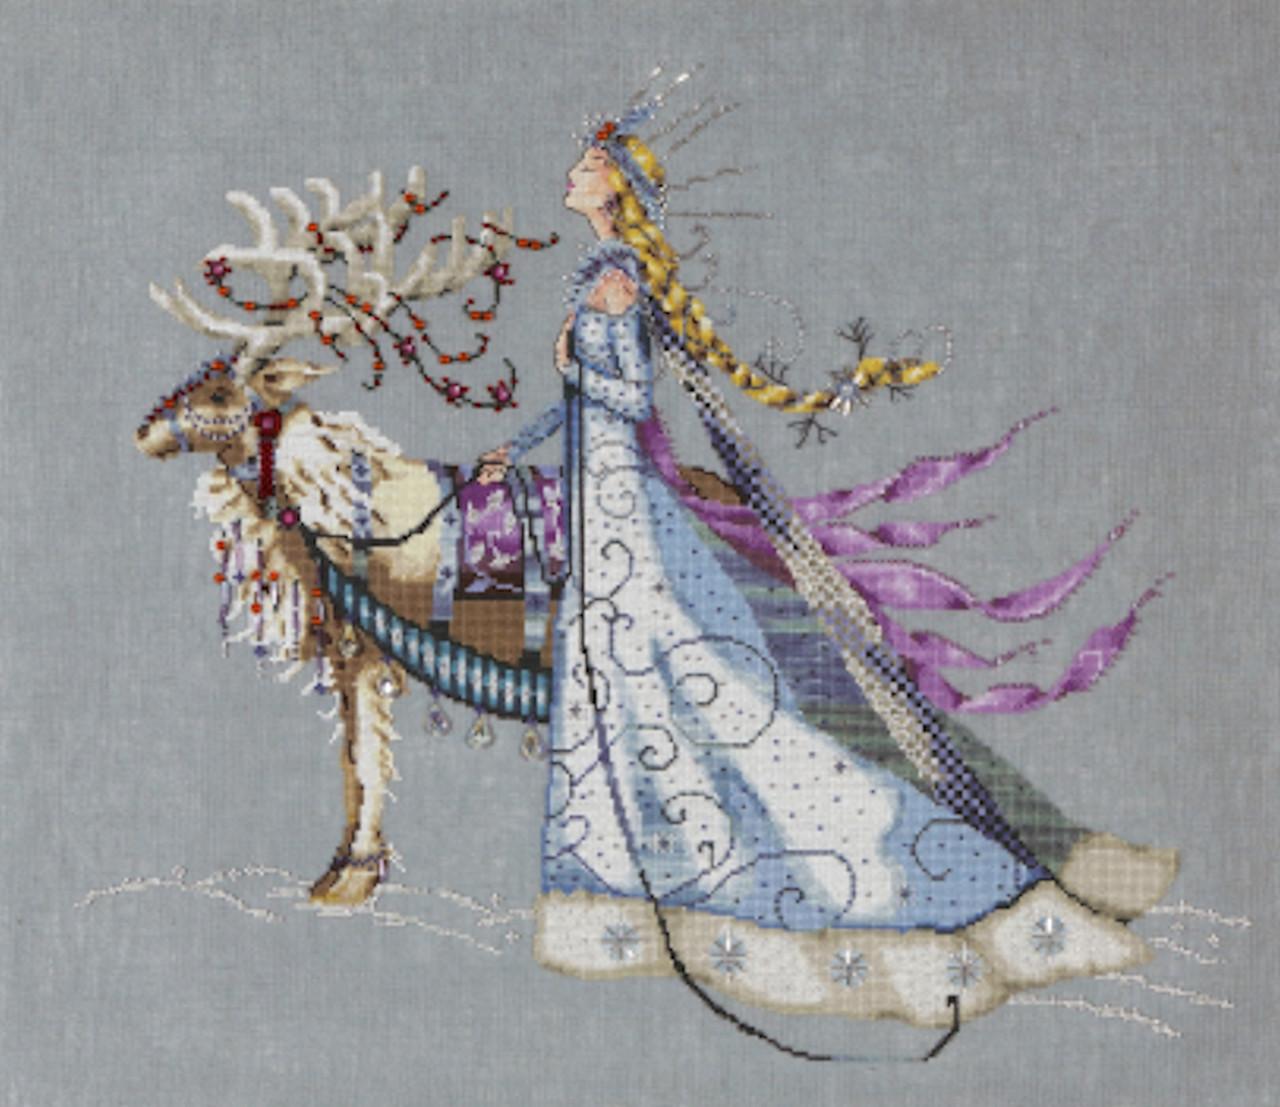 Mirabilia - The Snow Queen